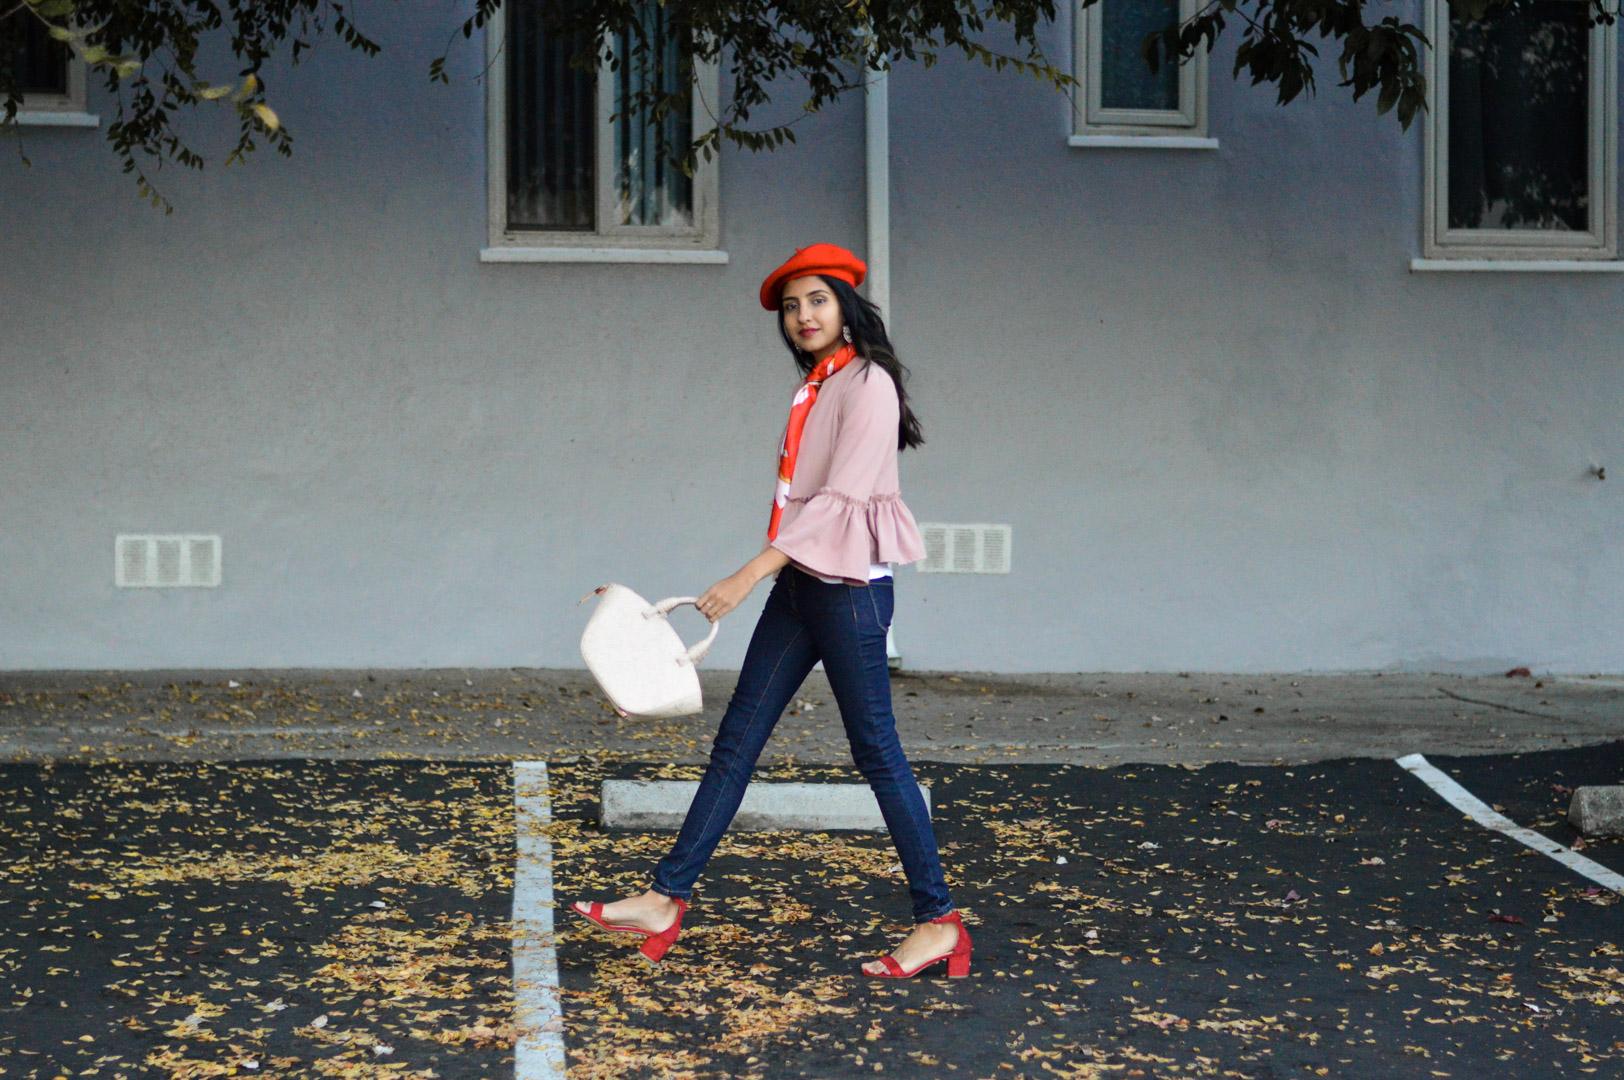 parisian-chic-blogger-style-winter-fashion 6